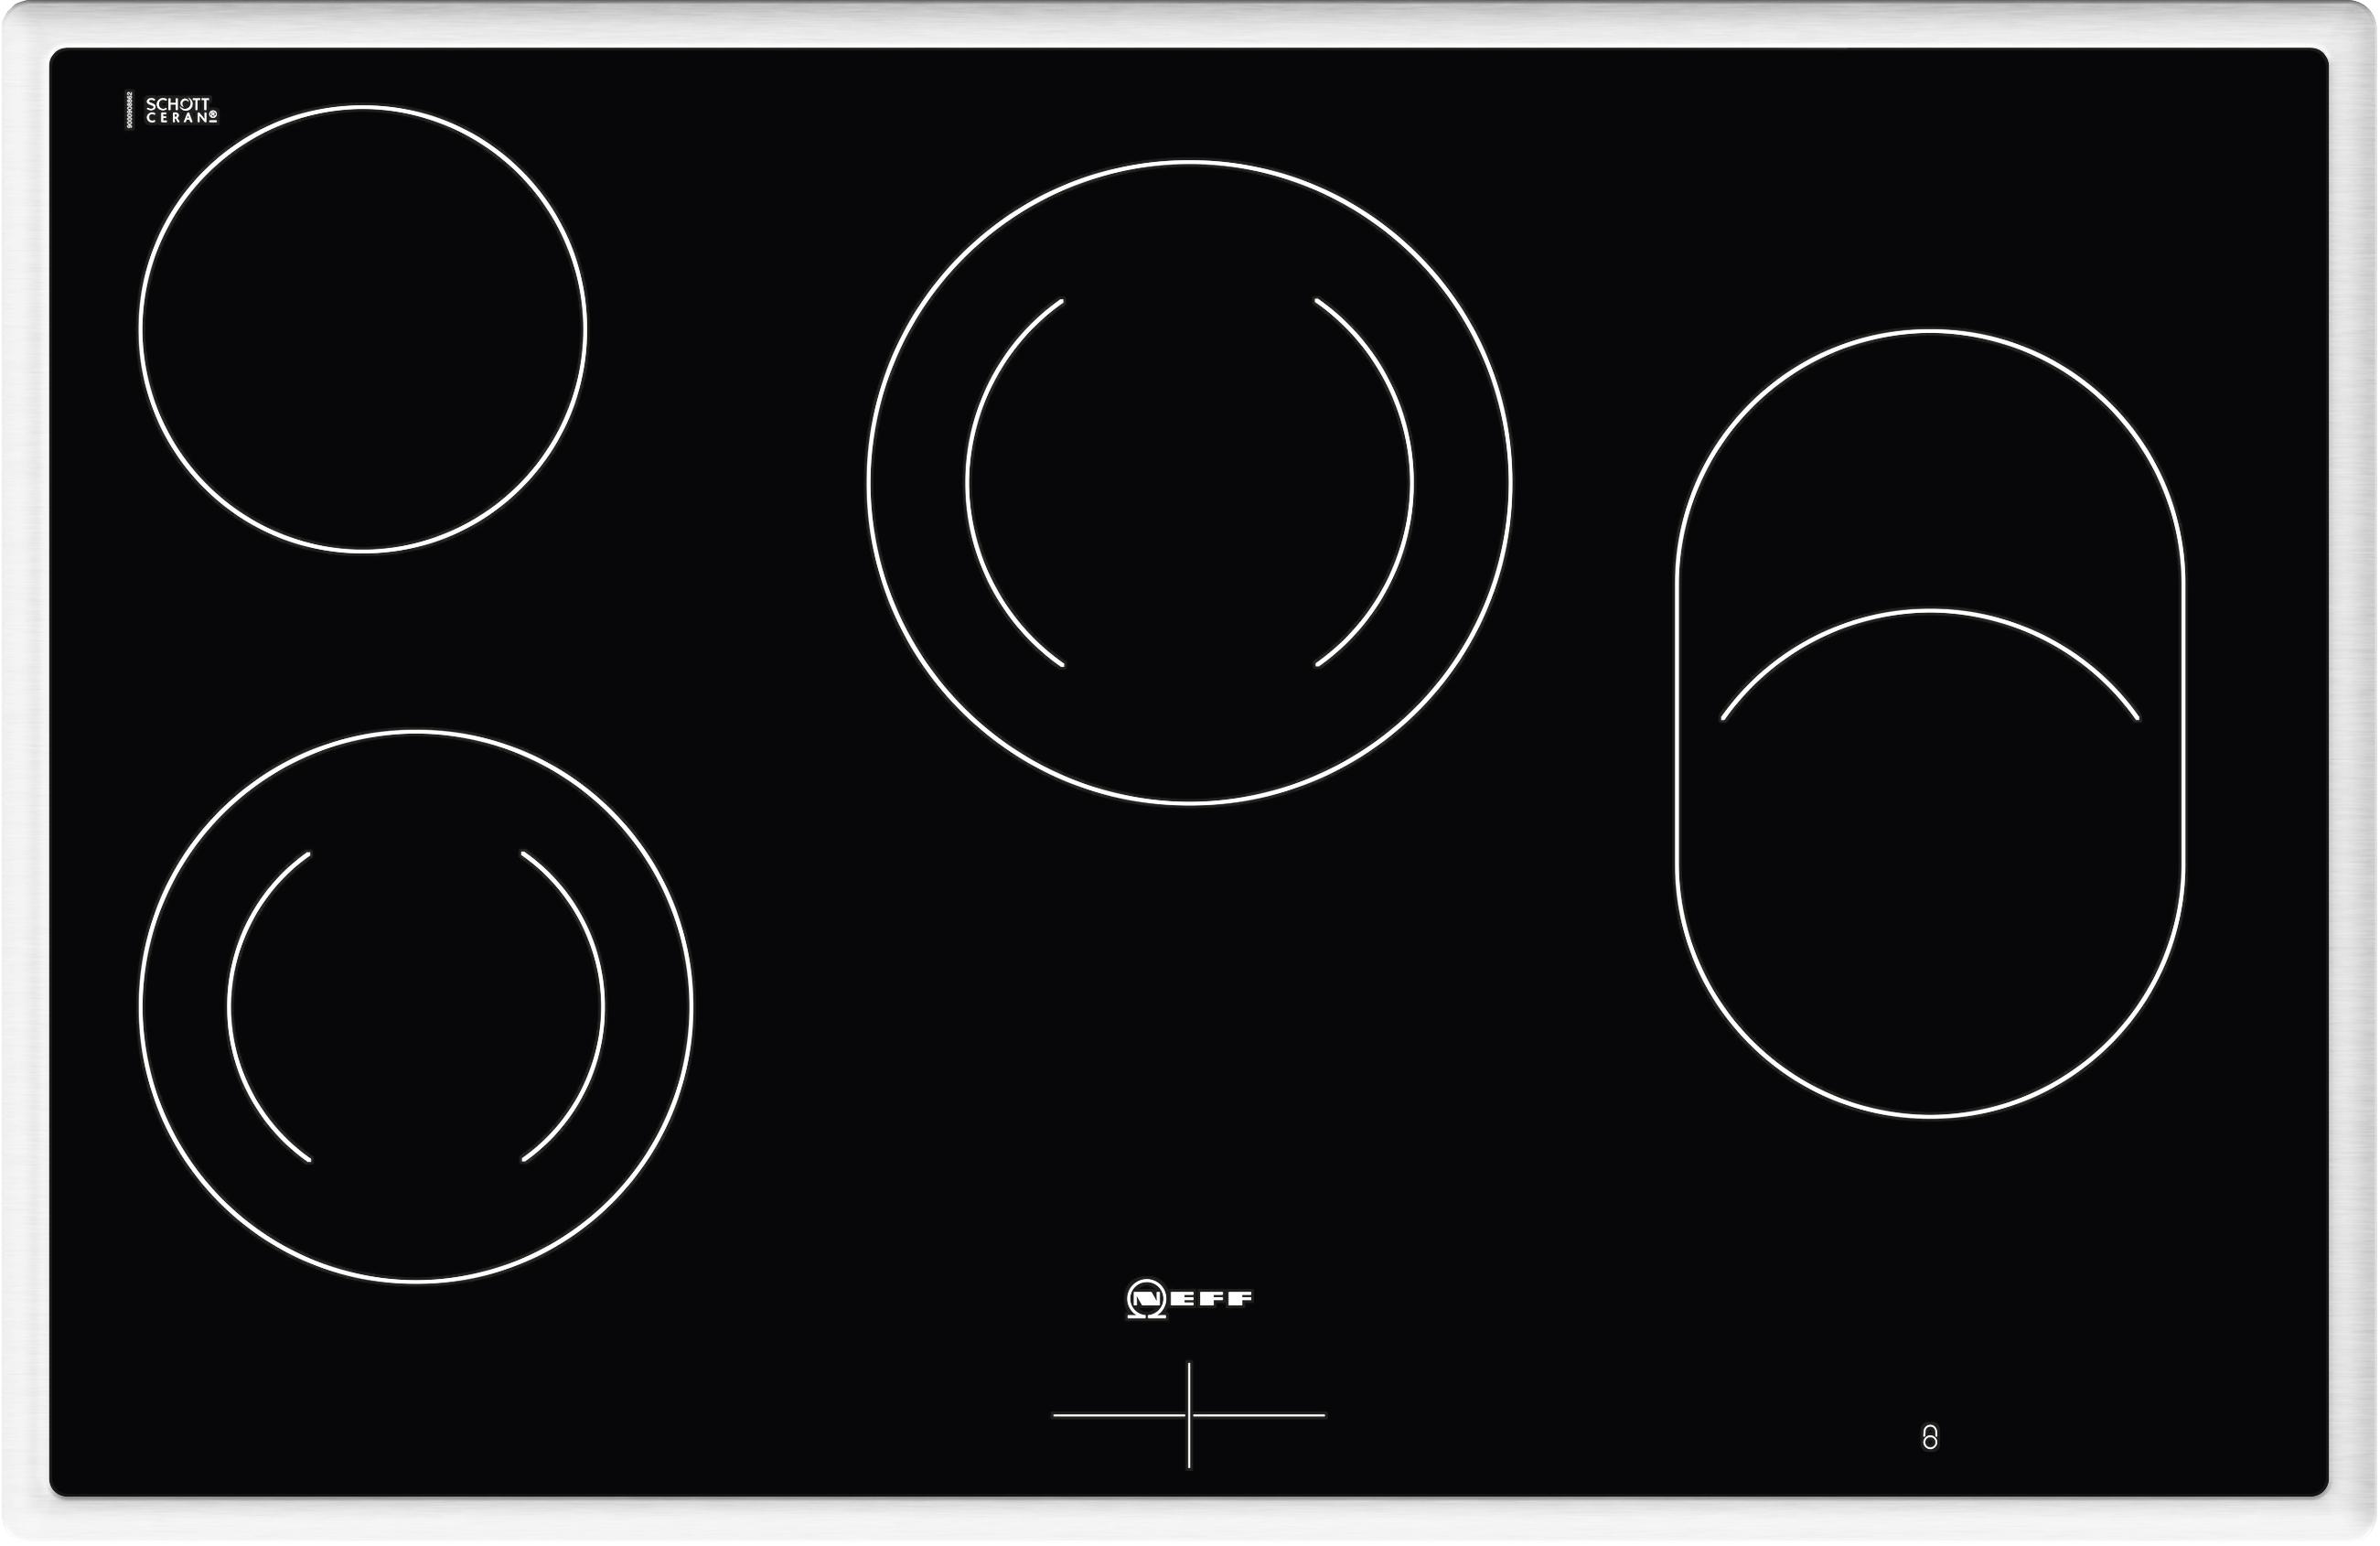 neff mr1383n elektro kochfeld m13r83n2 elektro glaskeramik kochfeld. Black Bedroom Furniture Sets. Home Design Ideas